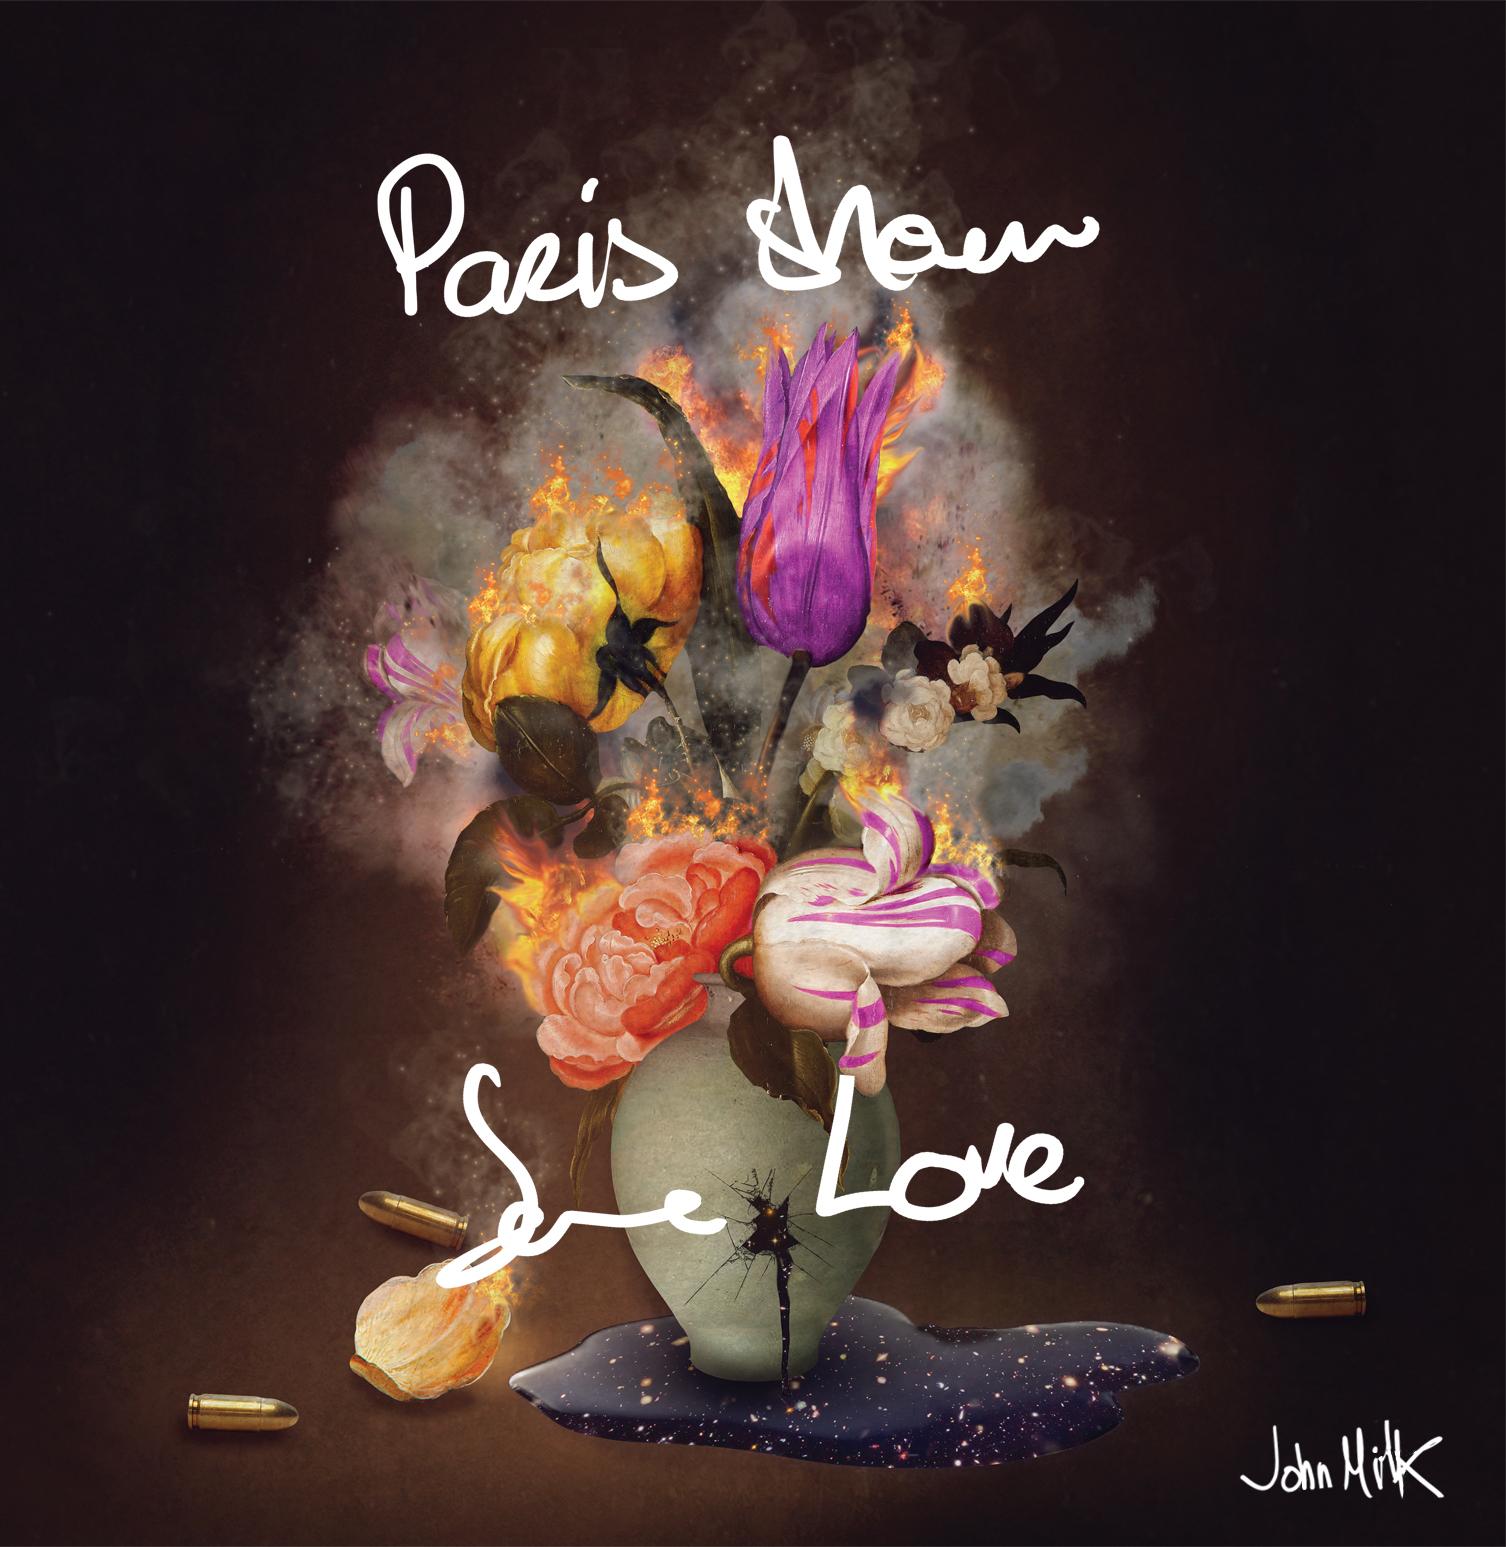 JOHN MILK : PARIS SHOW SOME LOVE